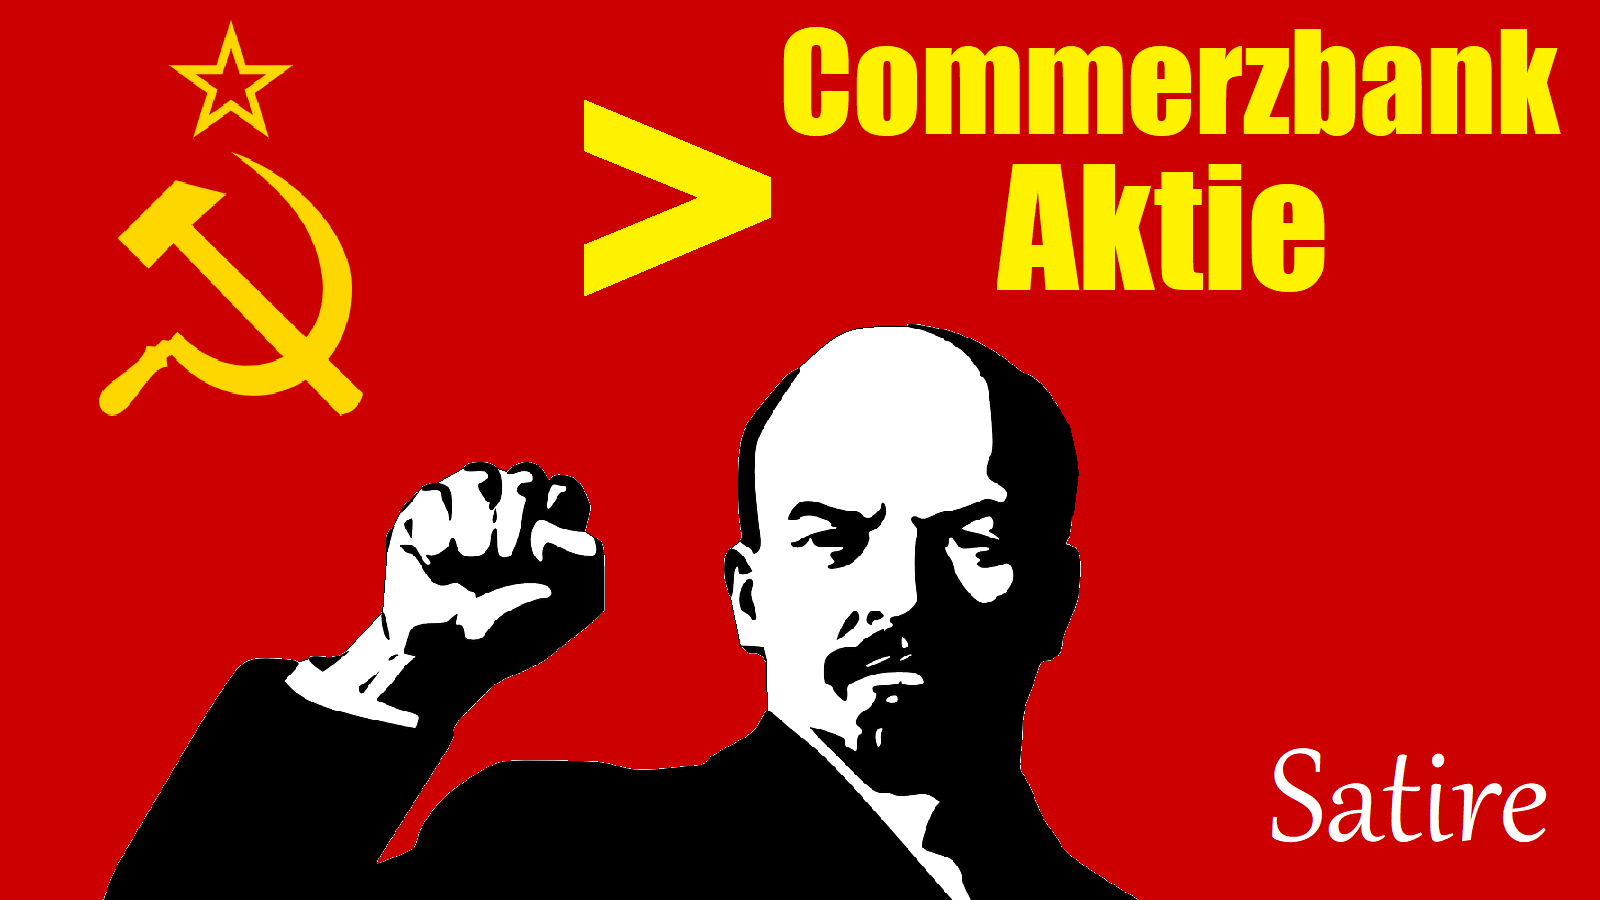 Commerzbank Aktie